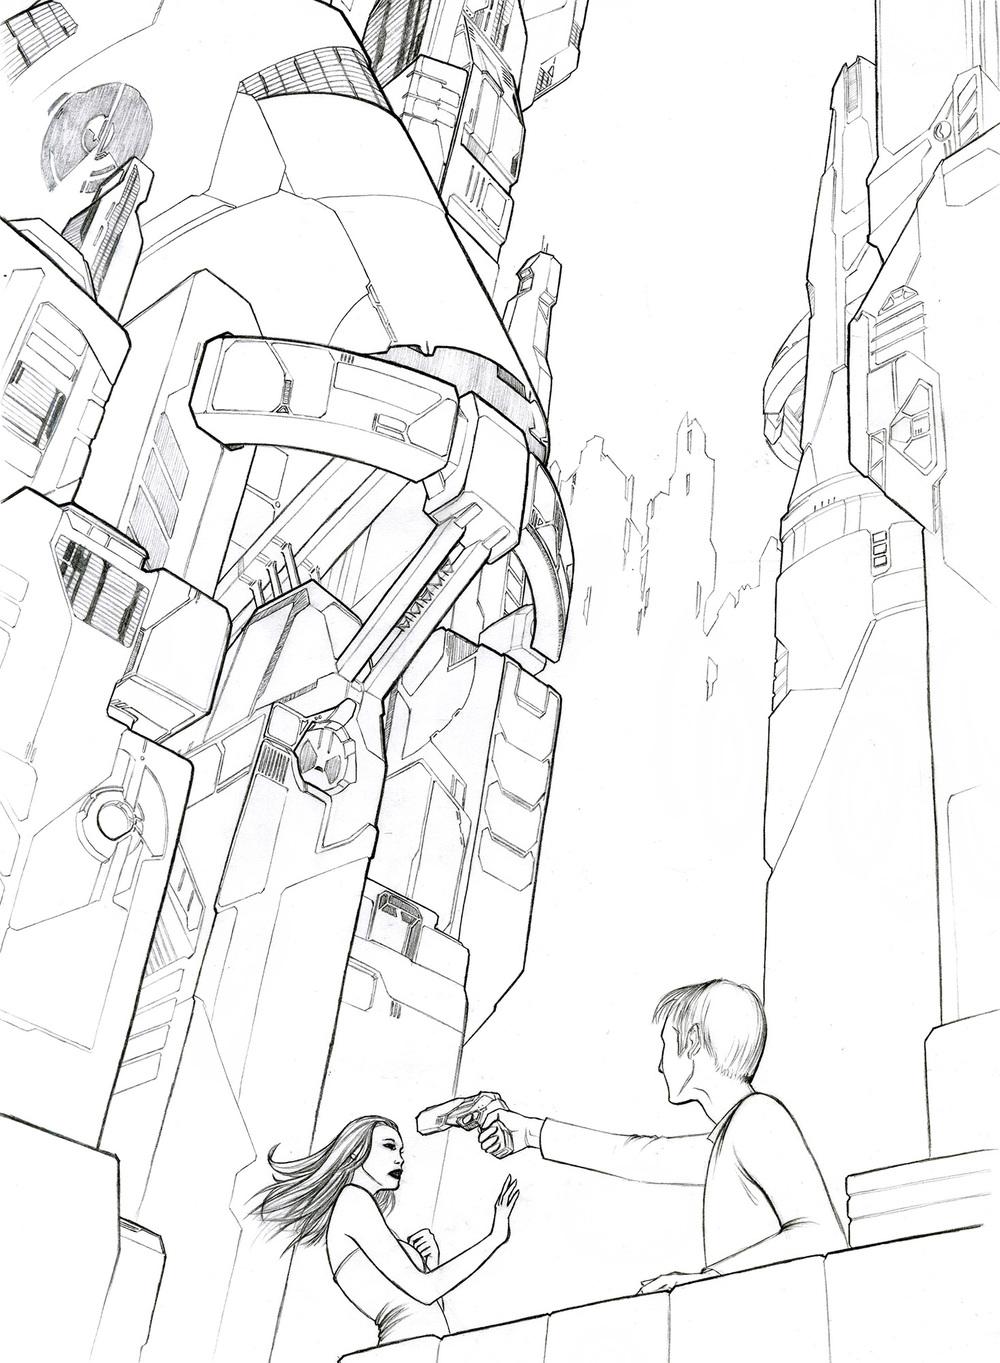 Drawing+5.jpg